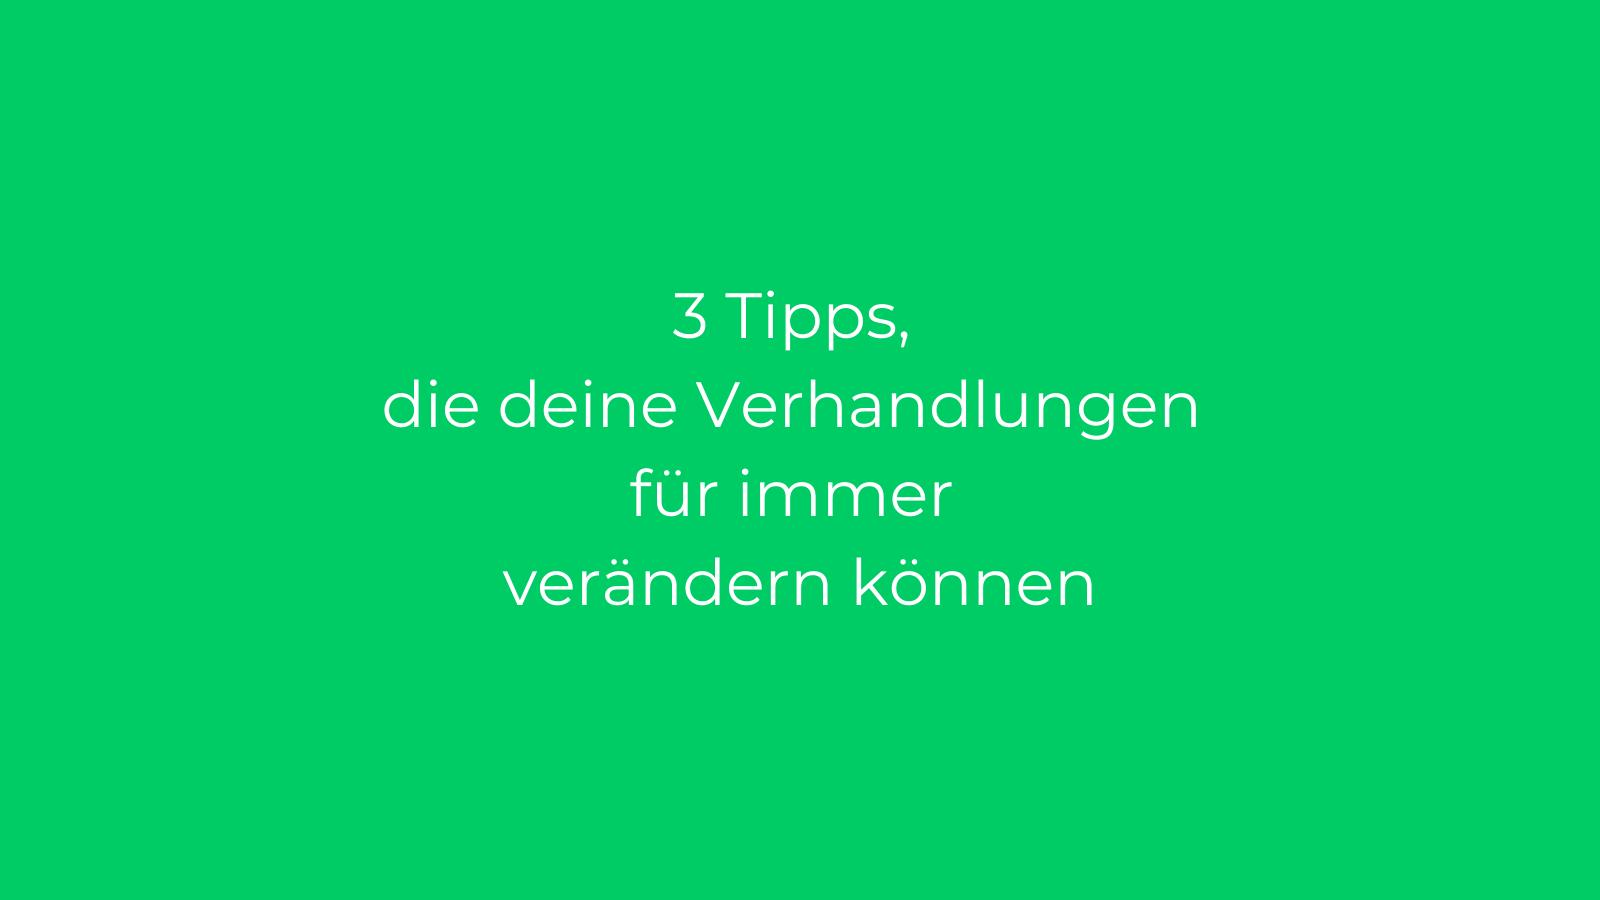 3 Tipps fuer Verhandlungen